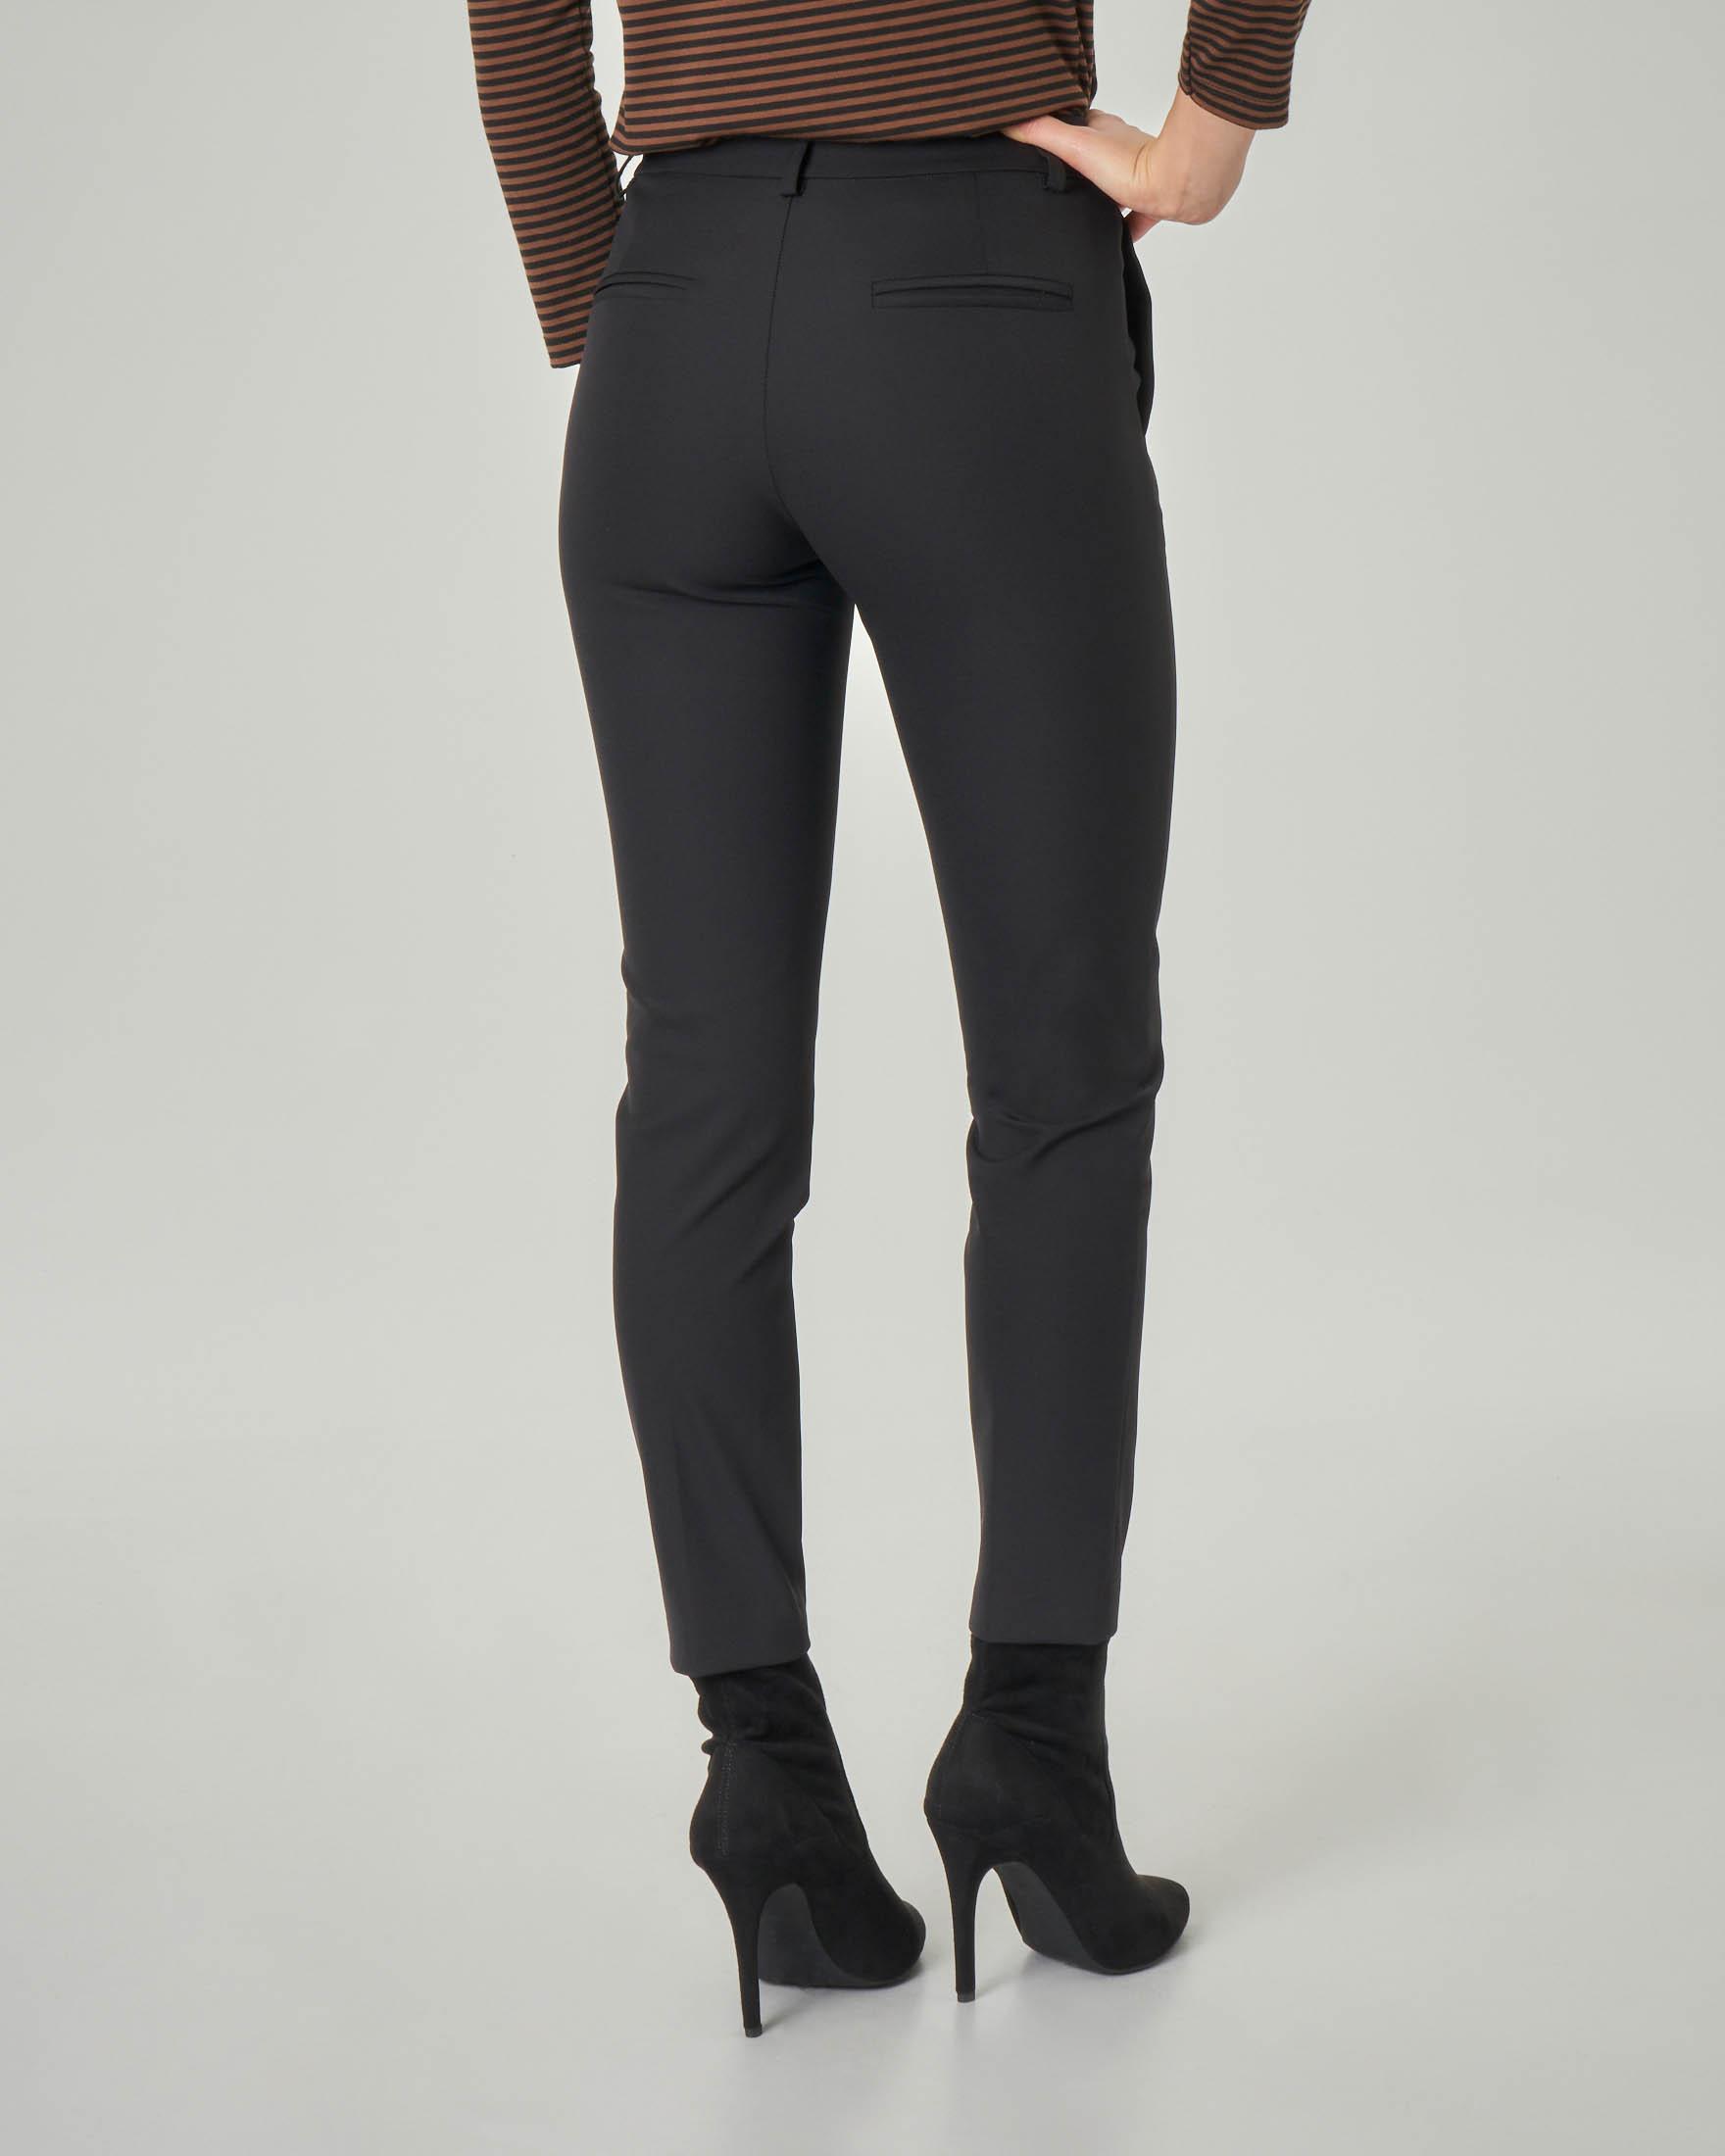 Pantalone nero skinny in tessuto stretch